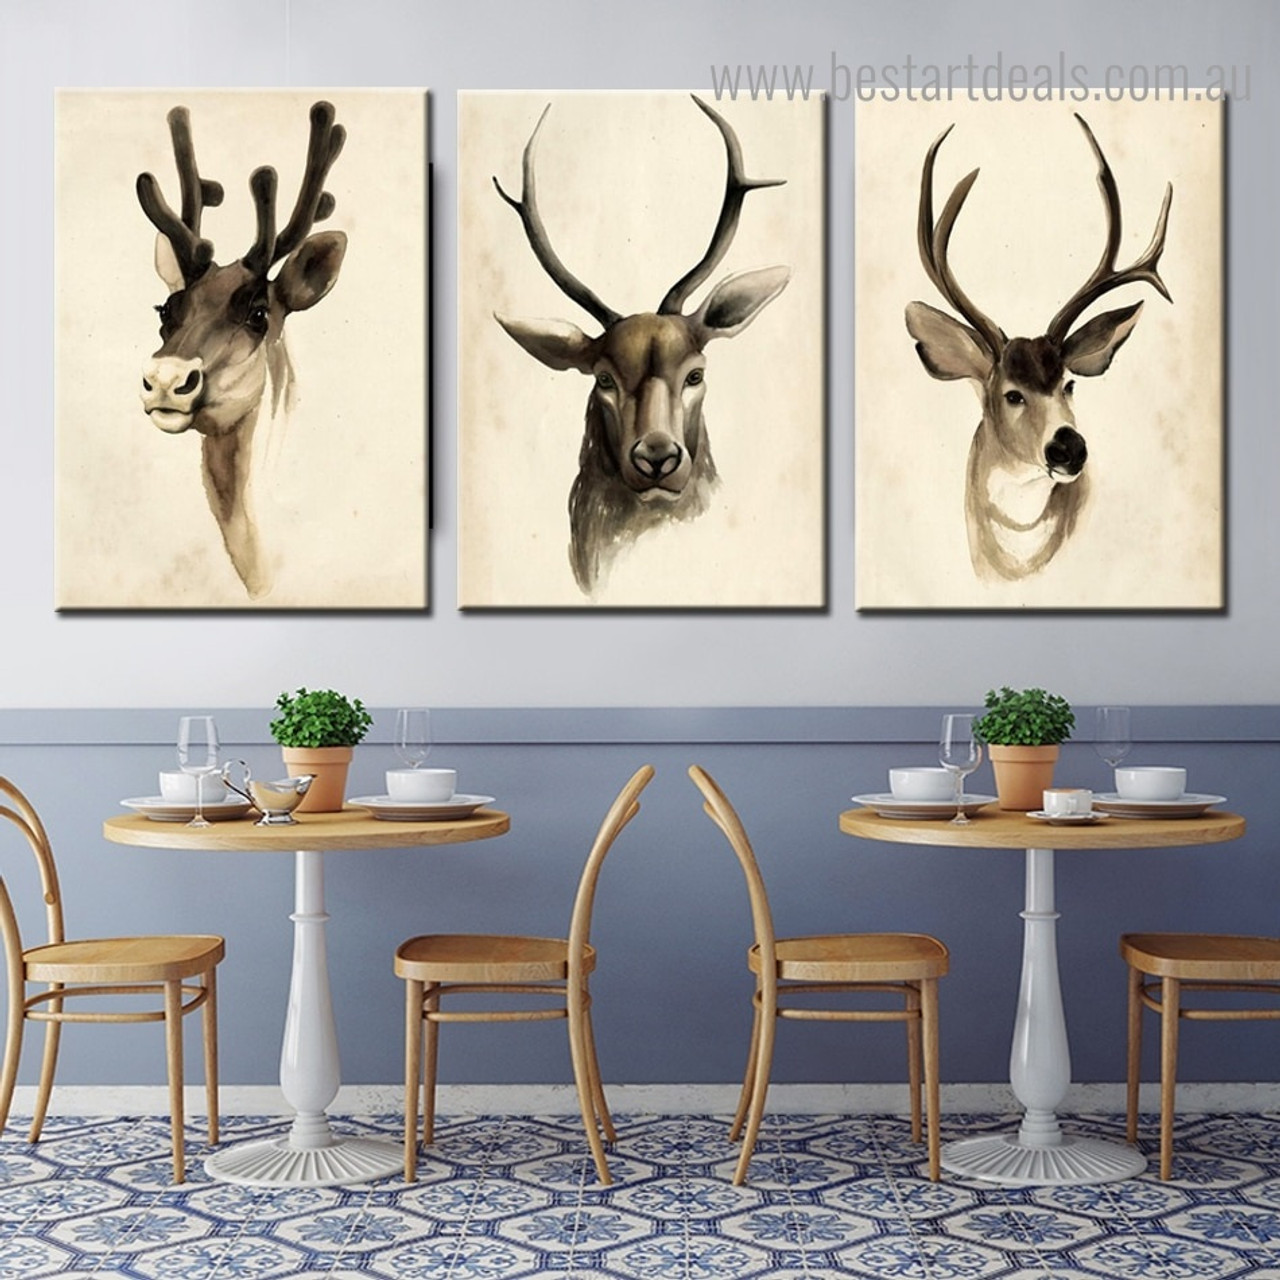 Buy Horned Creature Canvas Print Wall Art Decor